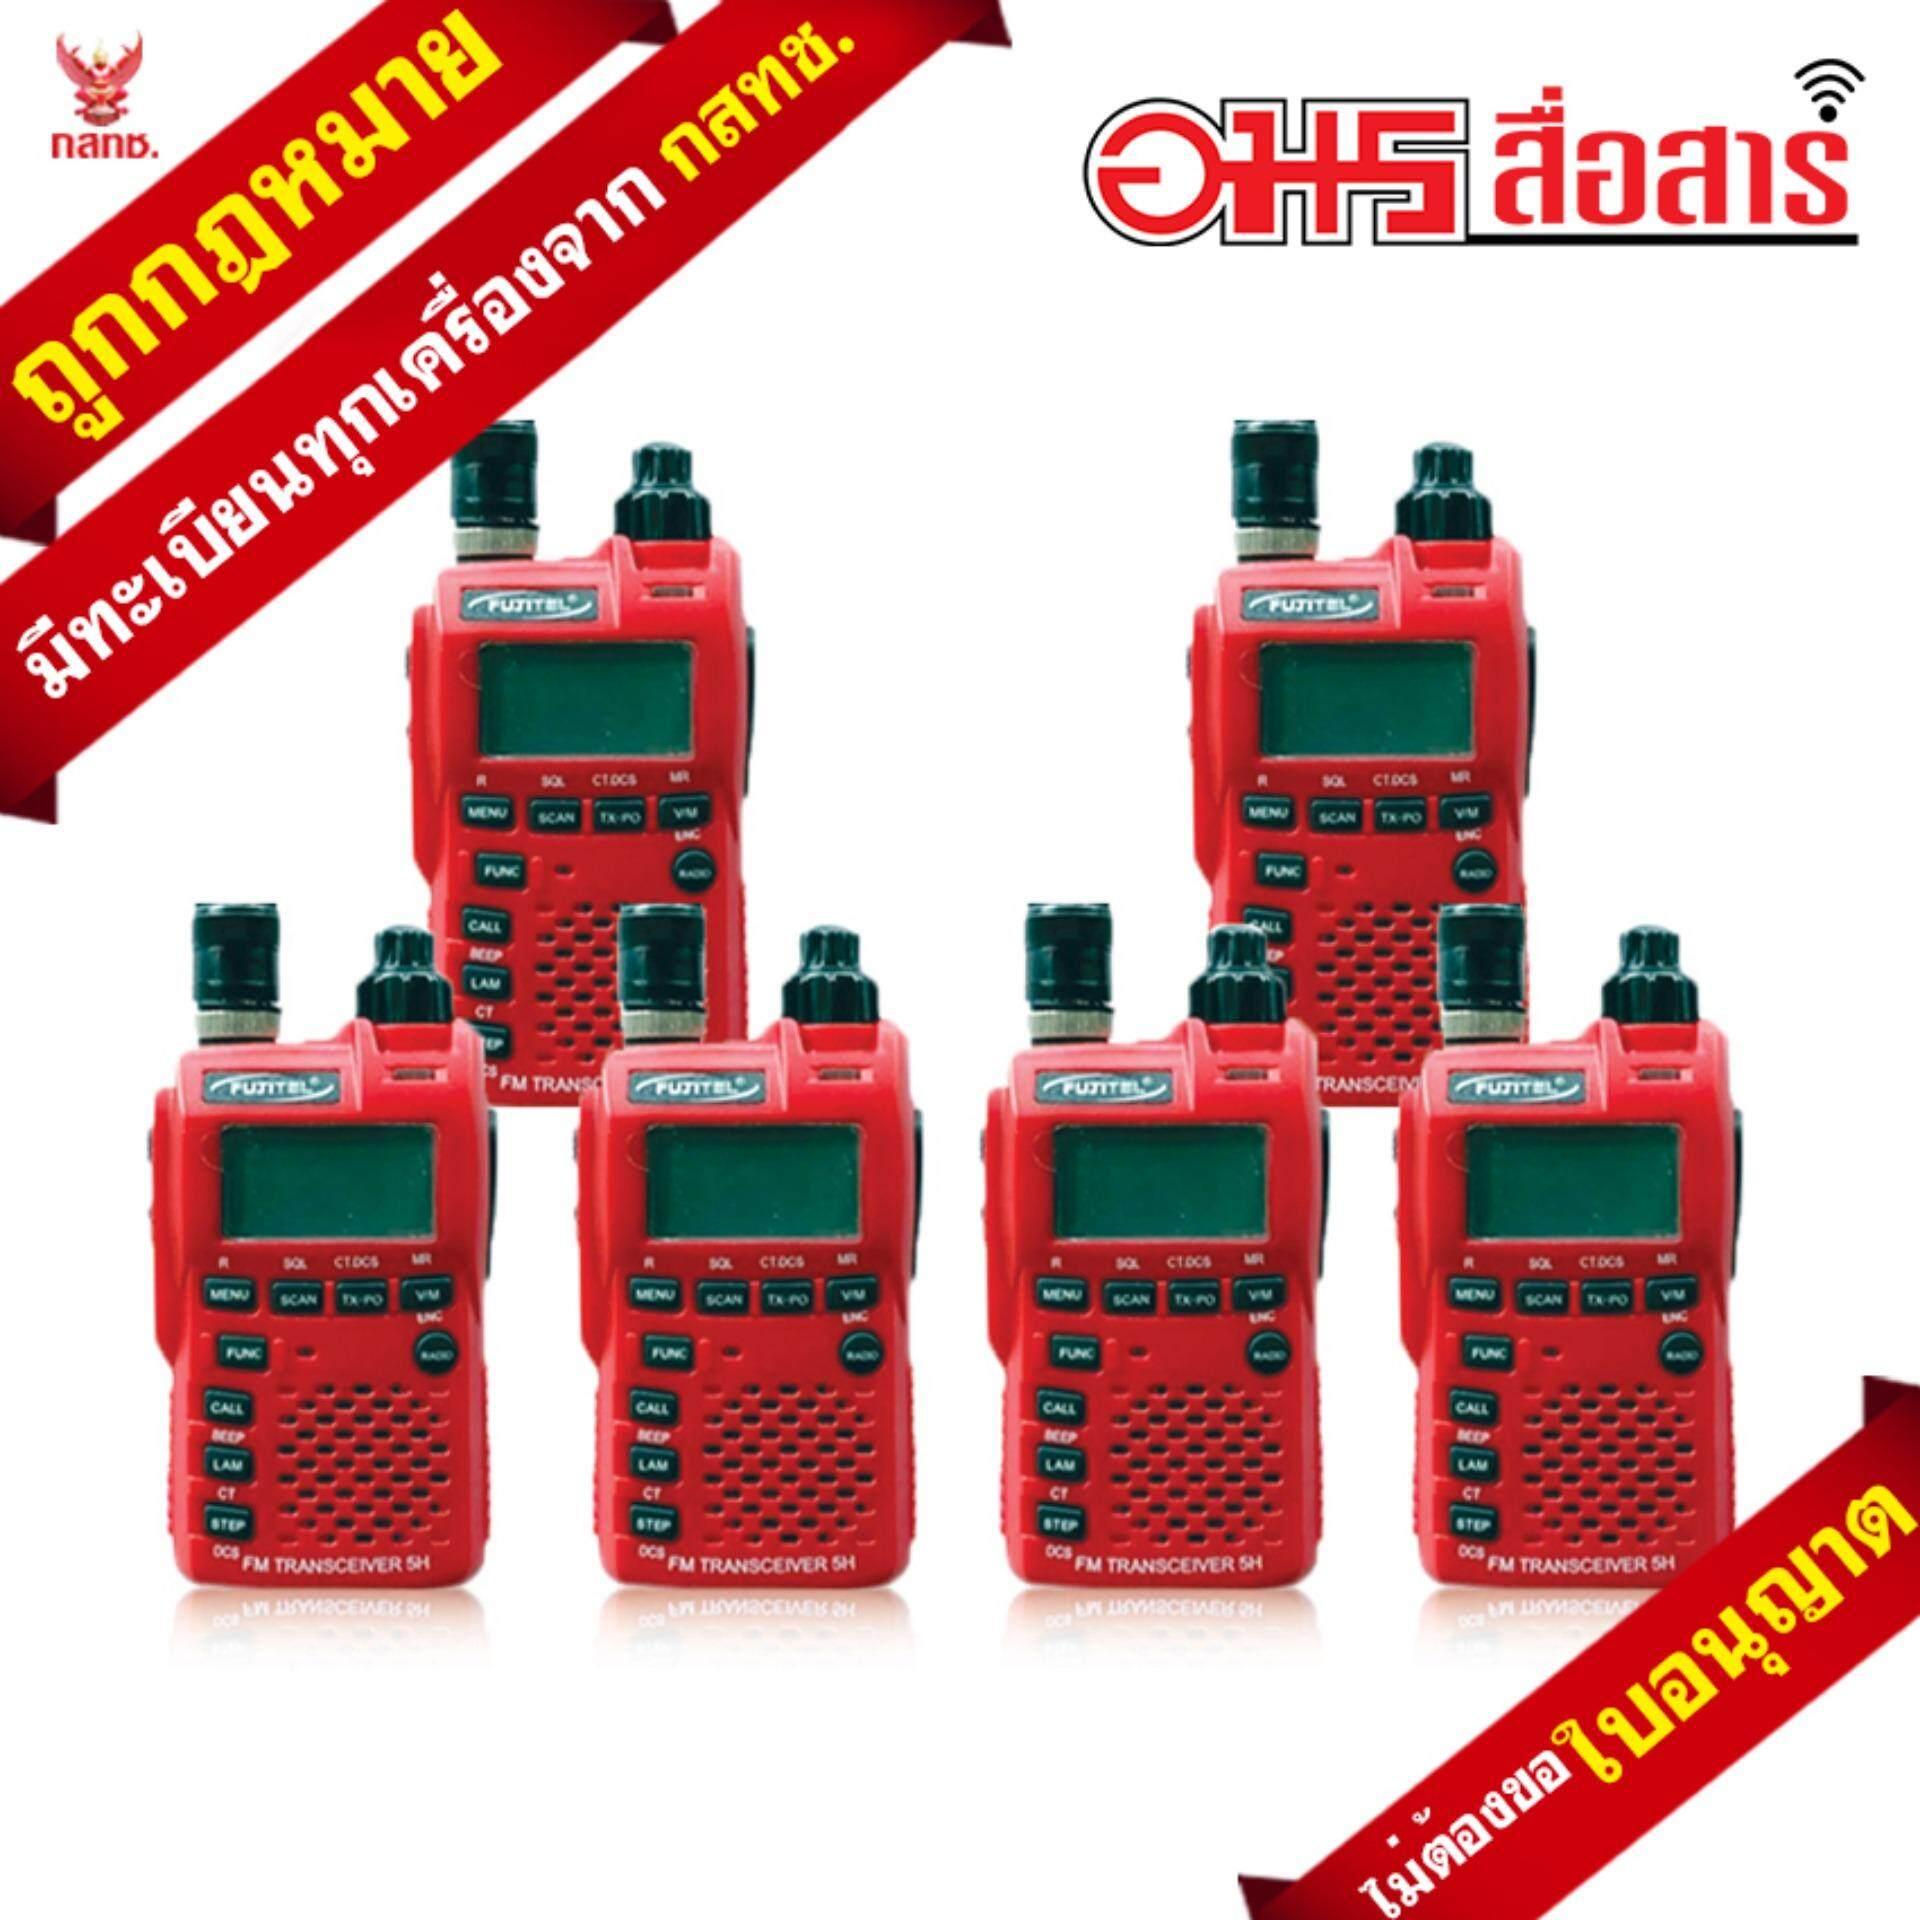 FUJITEL วิทยุสื่อสาร 0.5W FB-5H สีแดง แพ็คหก ถูกกฎหมาย ได้รับการยกเว้นใบอนุญาตพกพา WALKIE TALKIE walkie-talkie อมรสื่อสาร